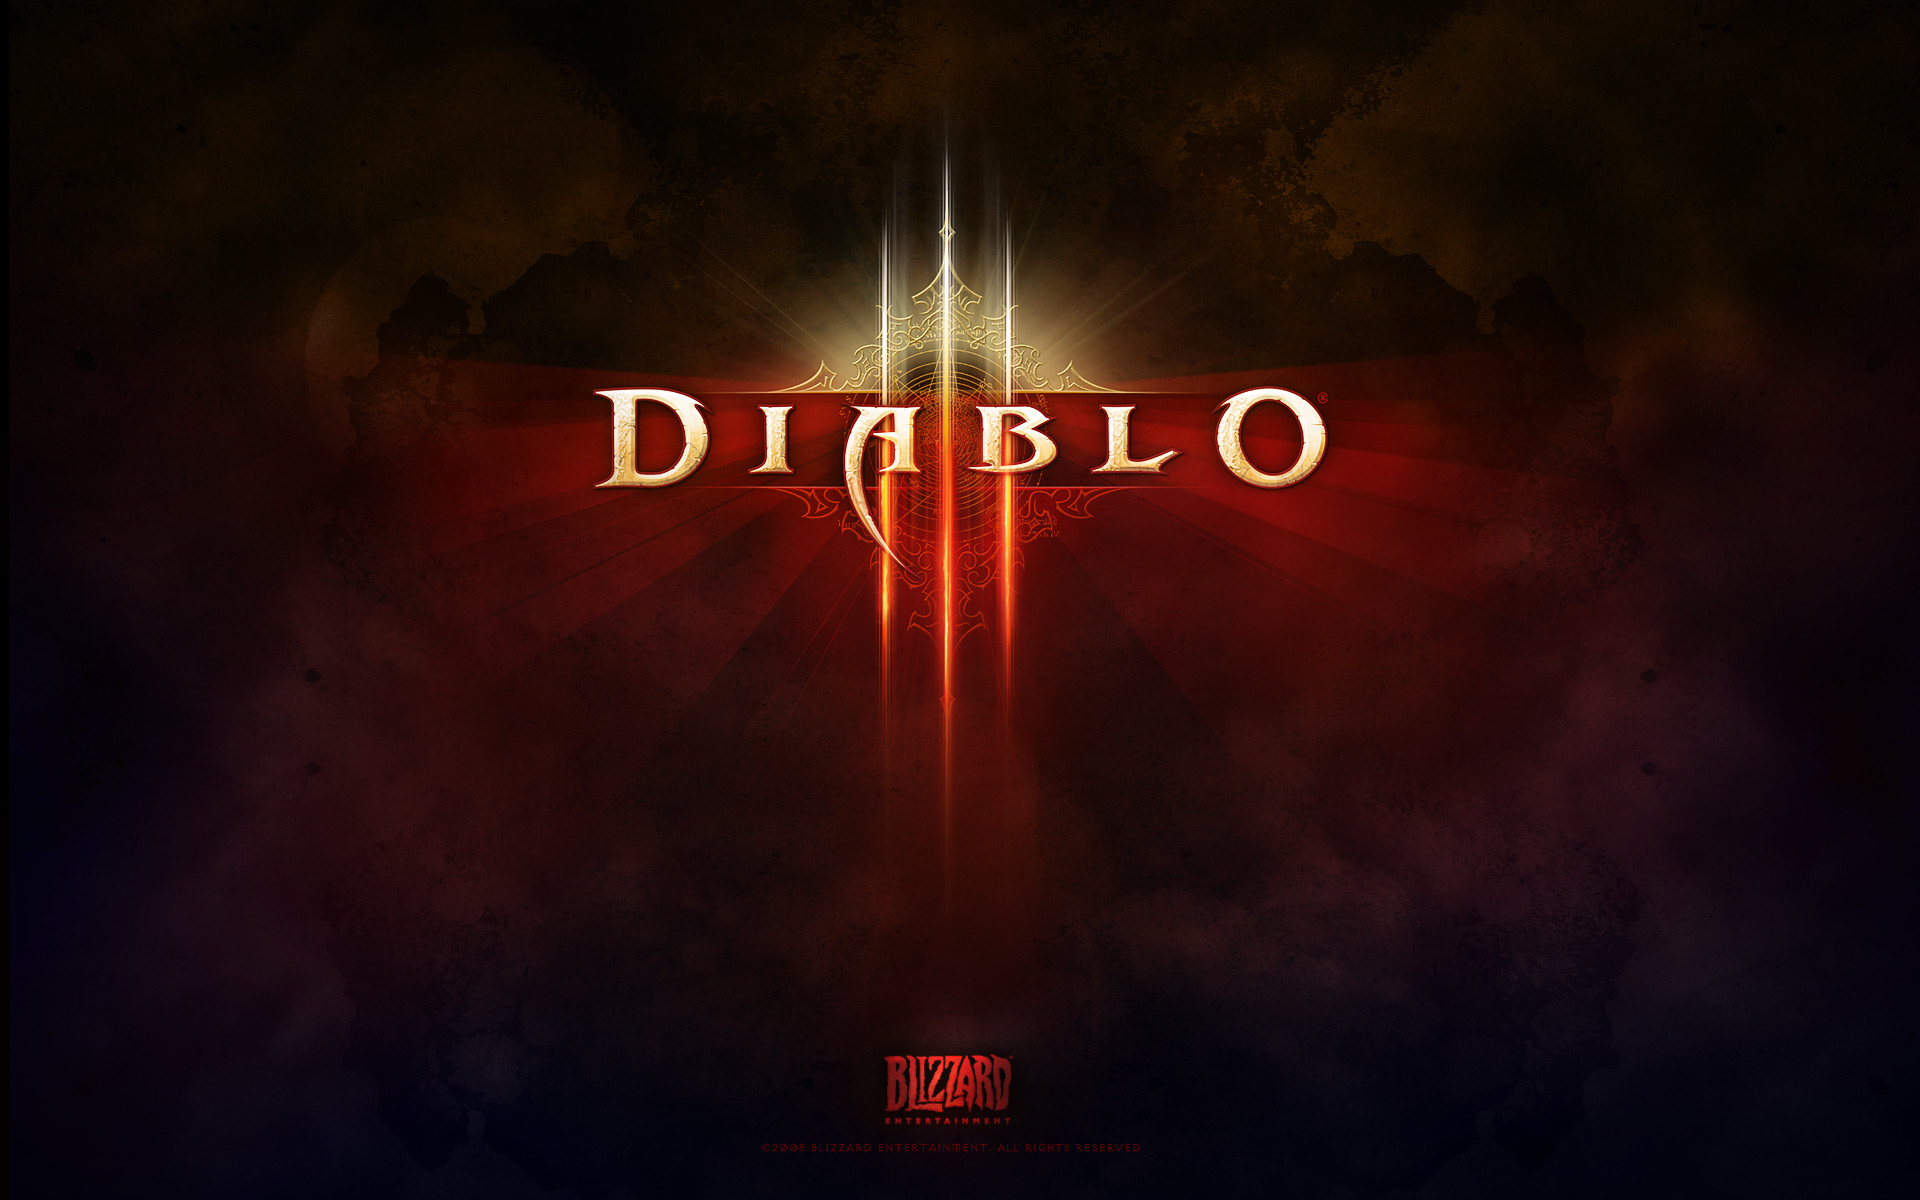 Diablo 3 wallpaper 20